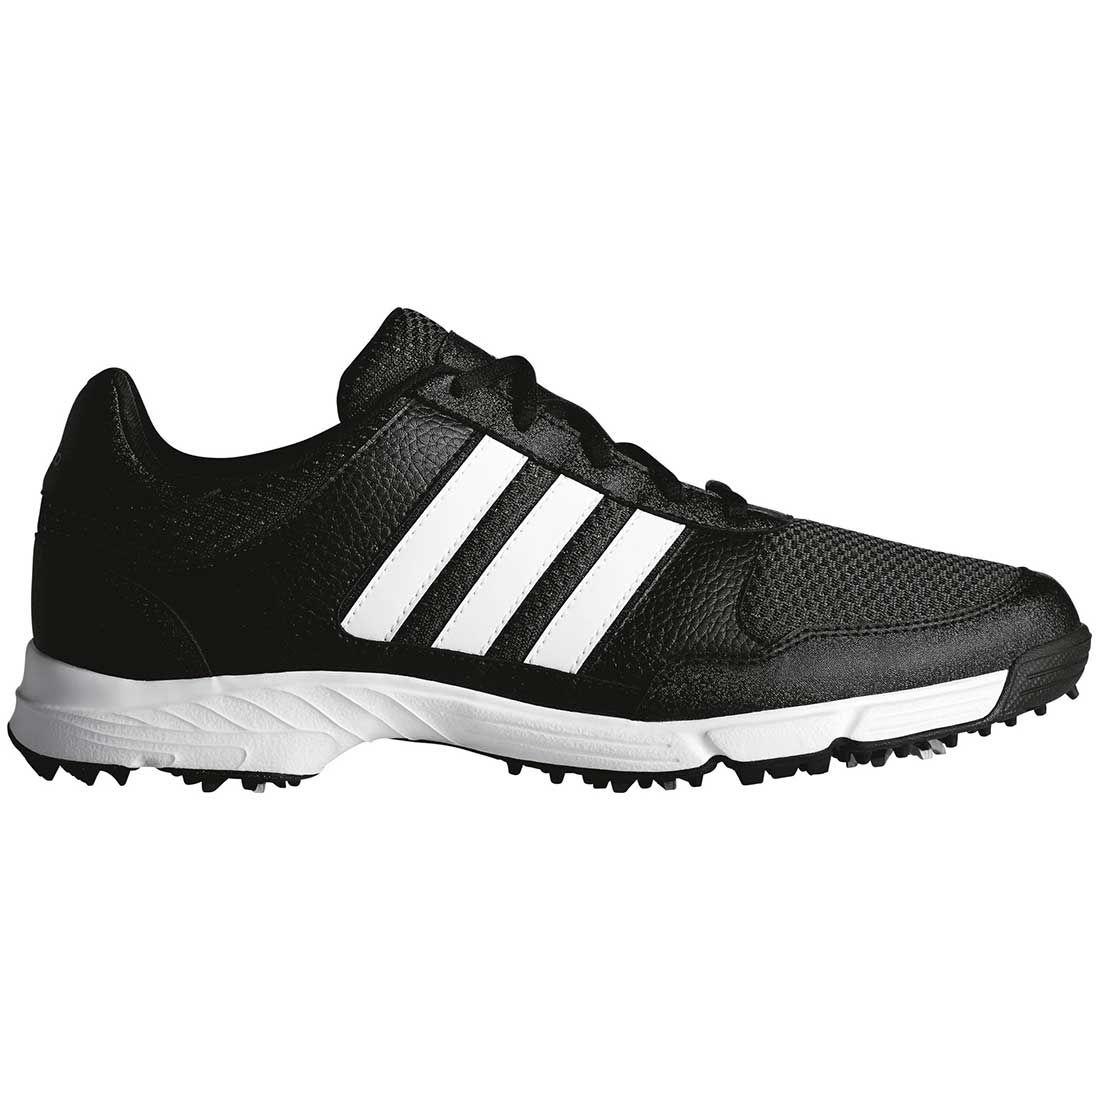 Adidas Tech Response Golf Shoes Black